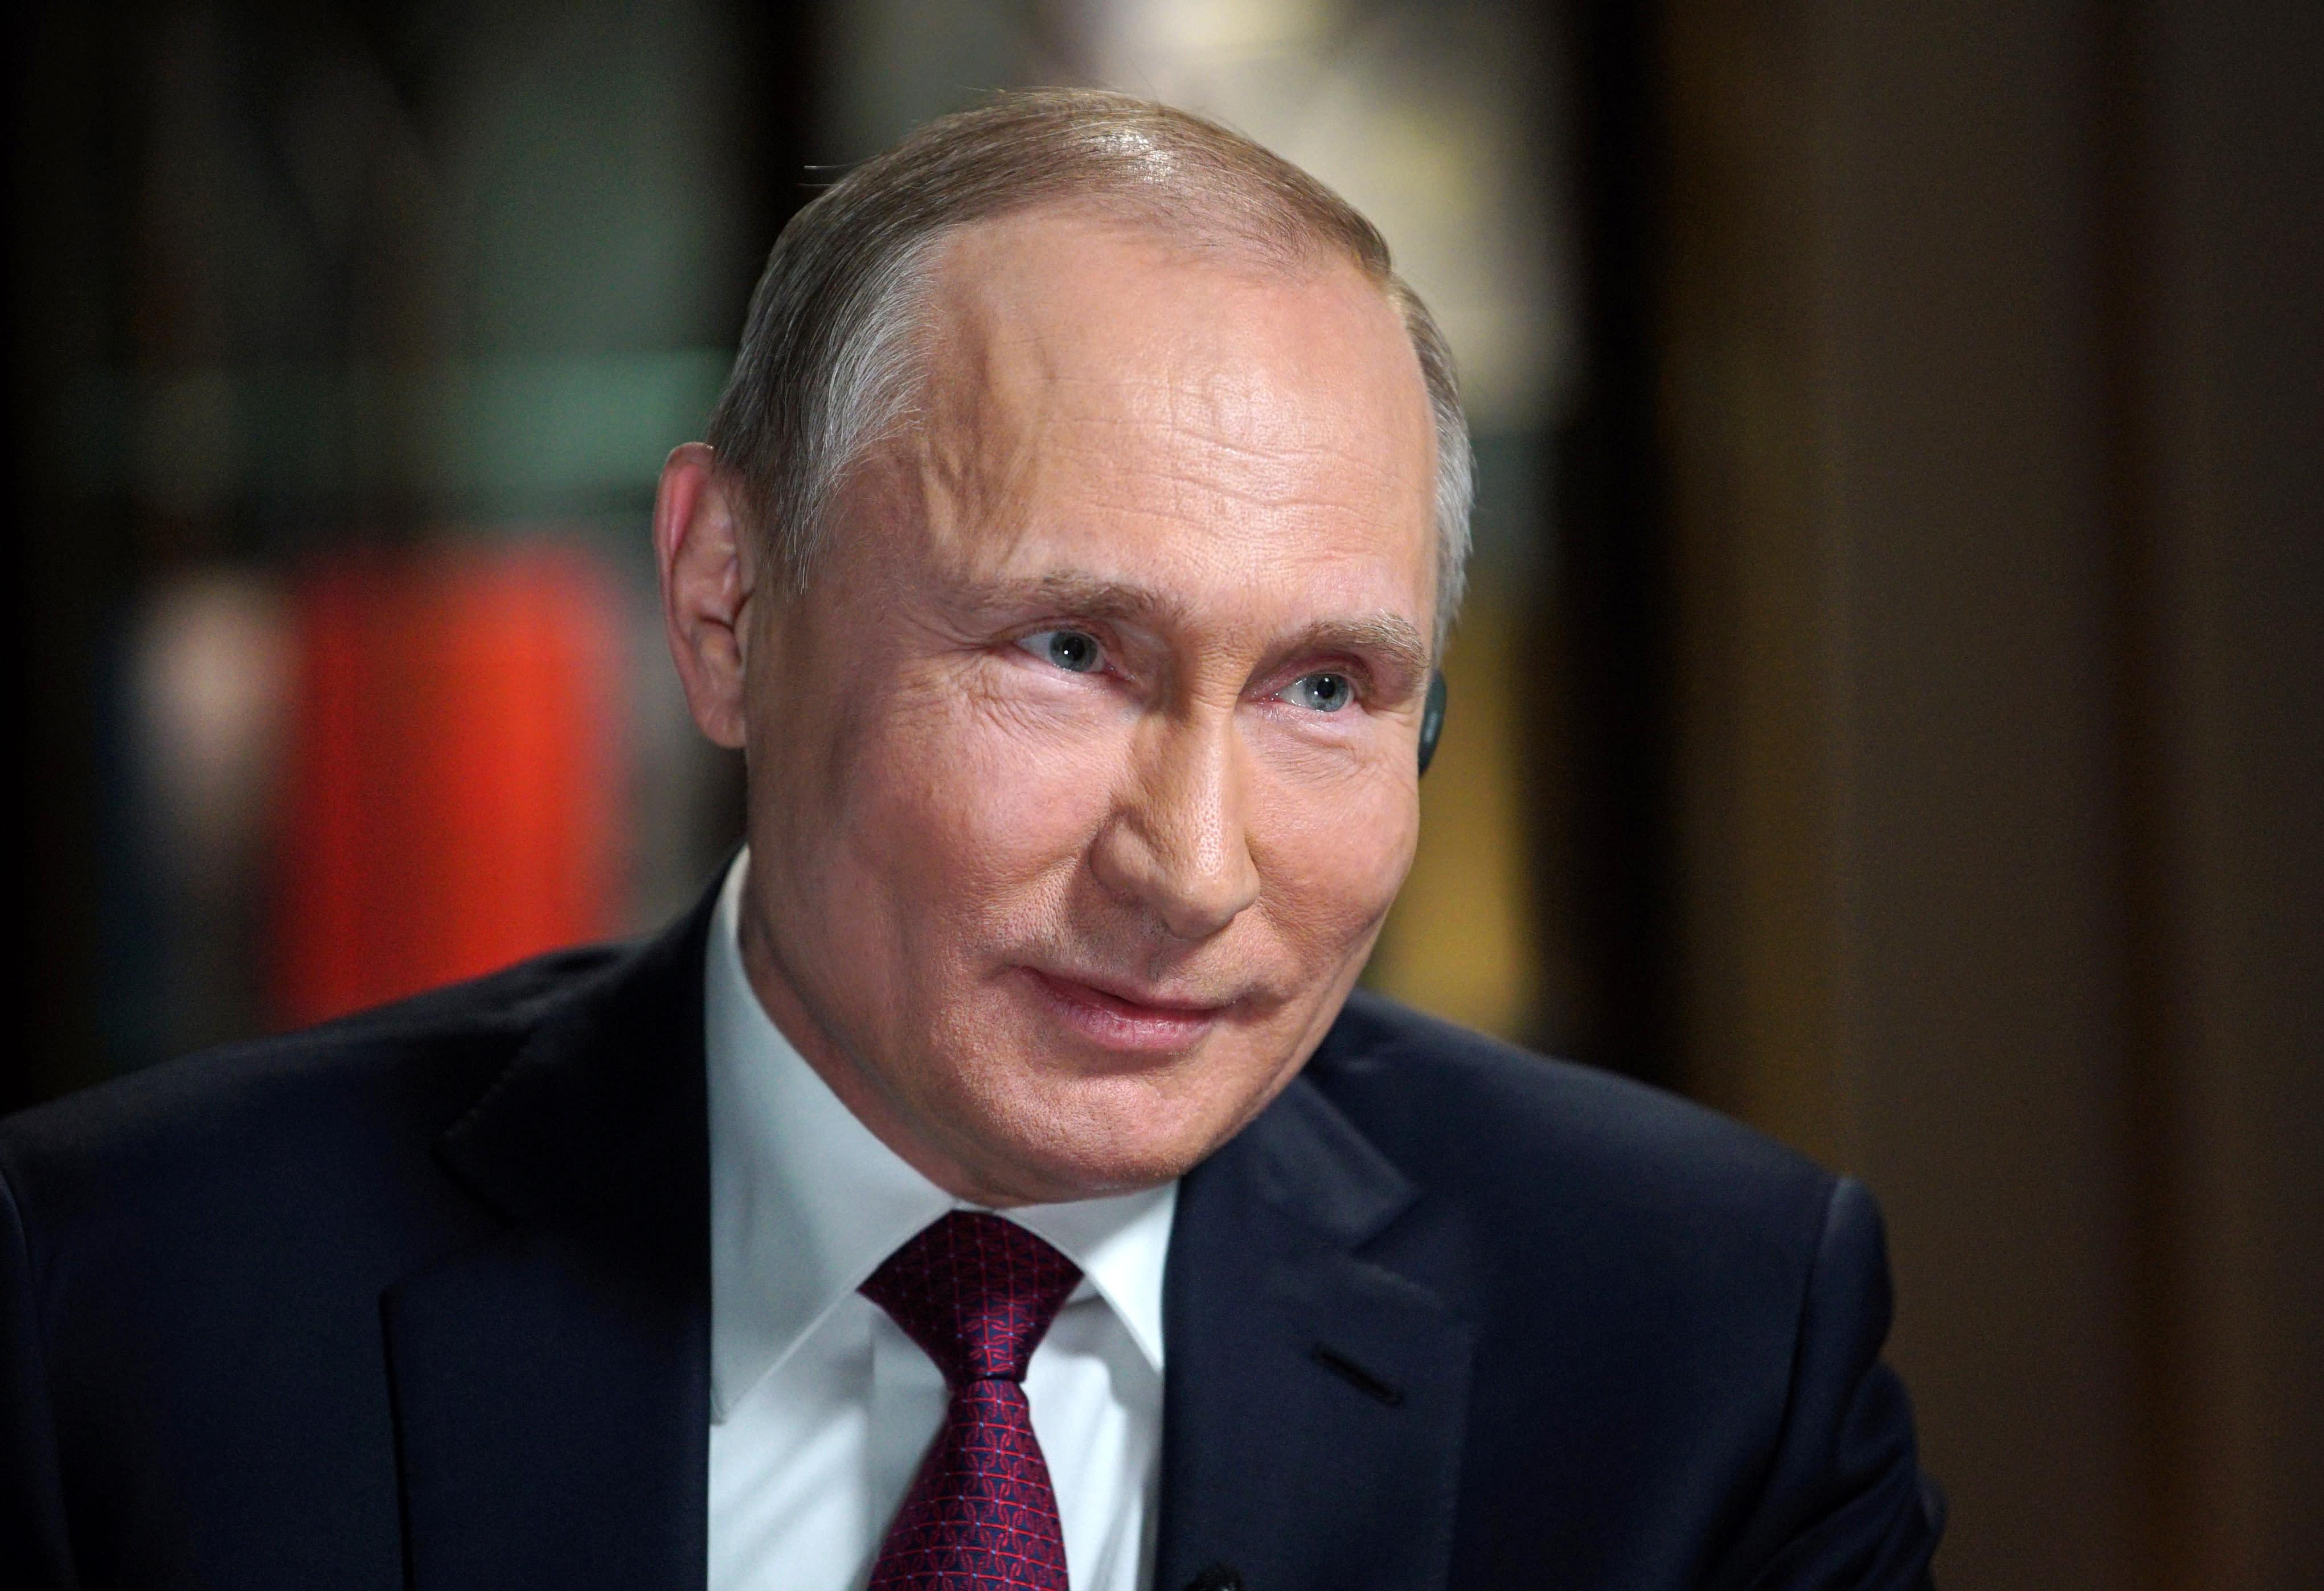 Russia Expels 60 U.S. Diplomats in Tit-for-Tat Retaliation